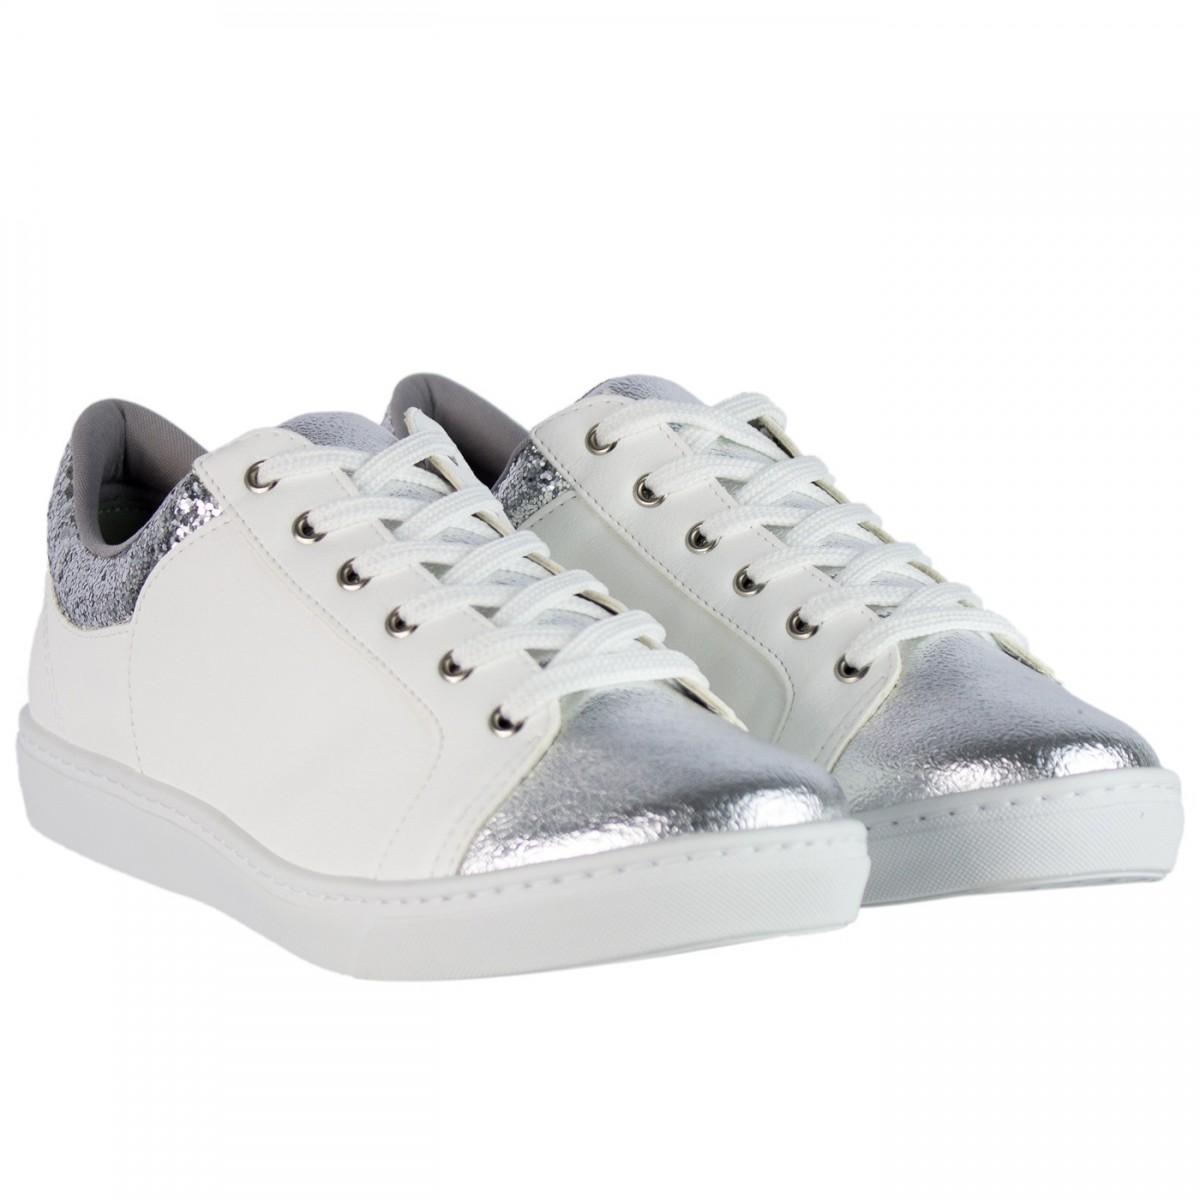 4aef24e78 Bizz Store - Tênis Feminino Via Marte Branco Couro Sintético Glitter